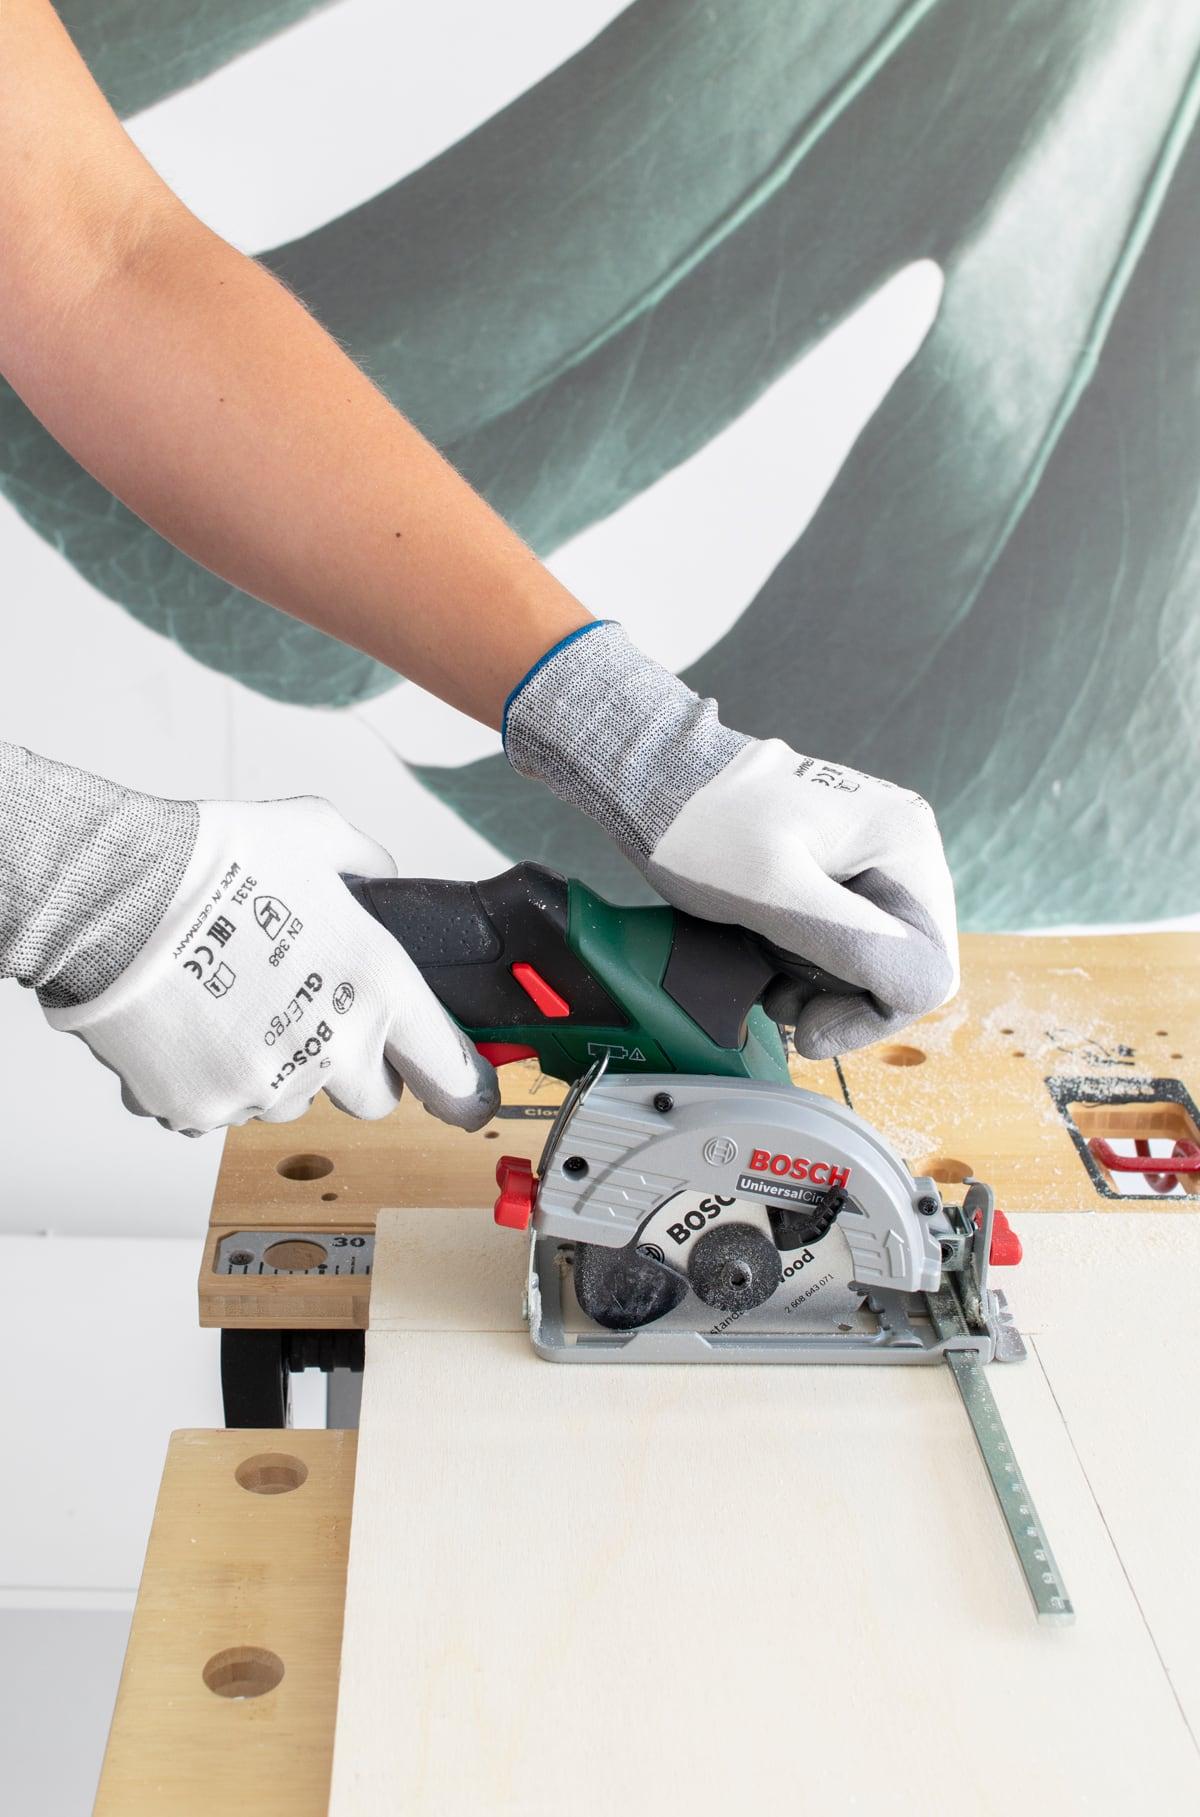 Bosch stappenplan zwevende wandplank - Tanja van Hoogdalem